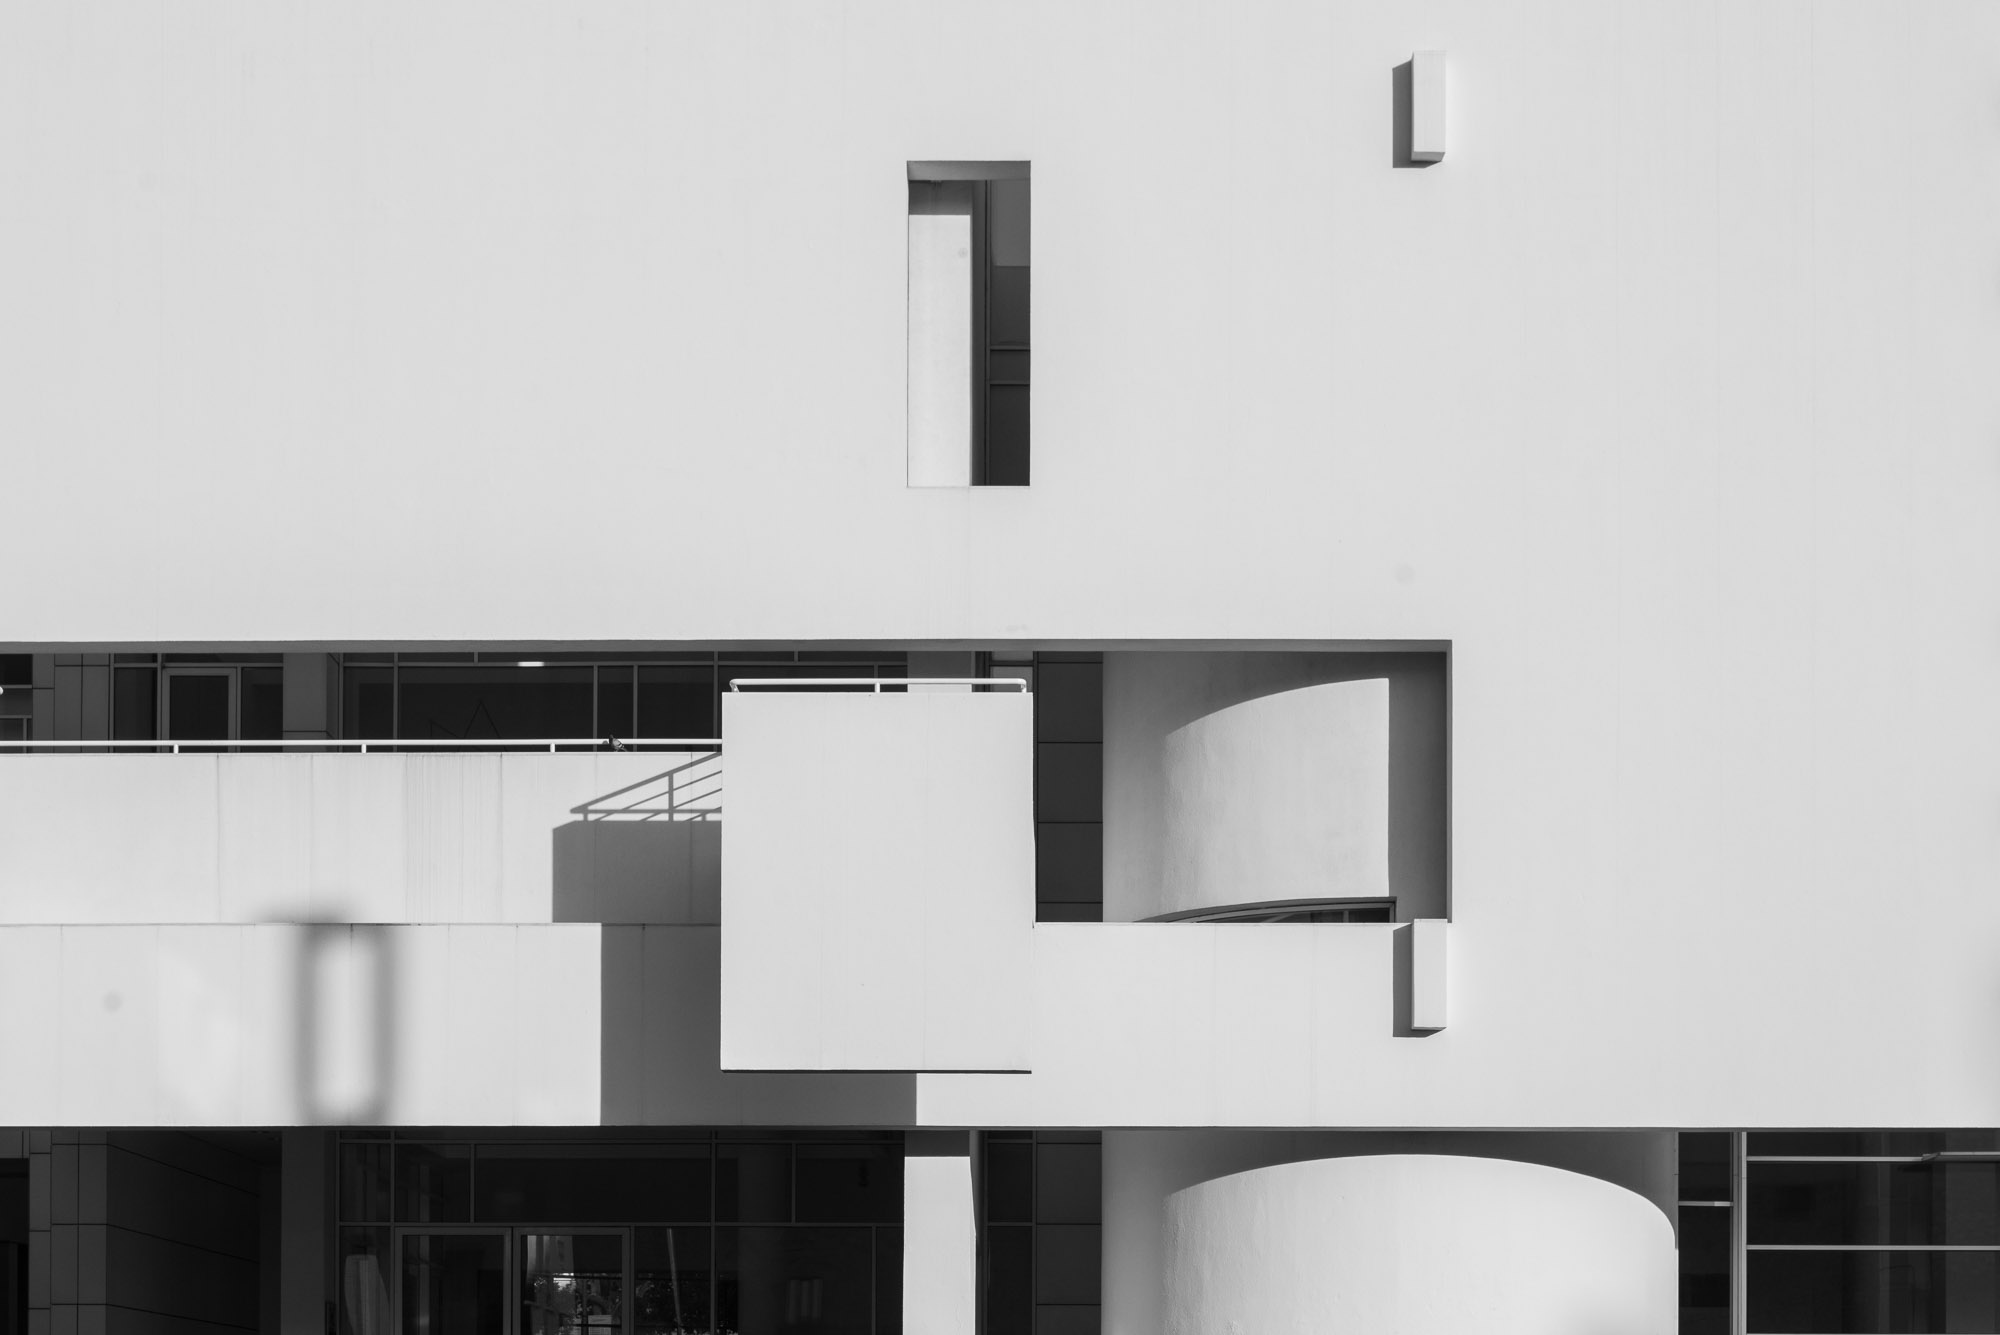 MACBA: Museu d'Art Contemporani de Barcelona